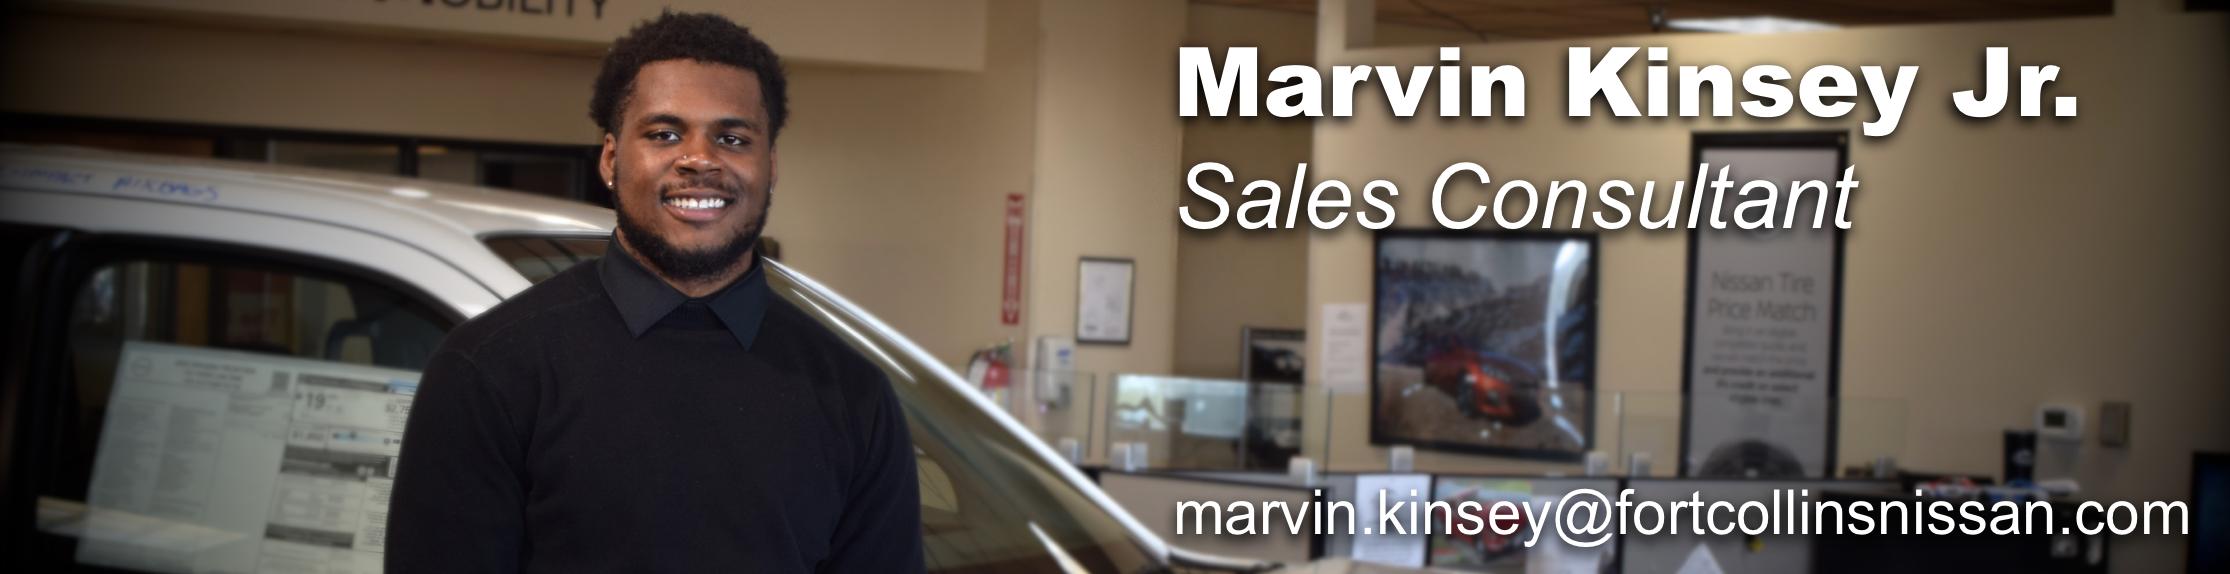 Marvin Kinsey Jr.